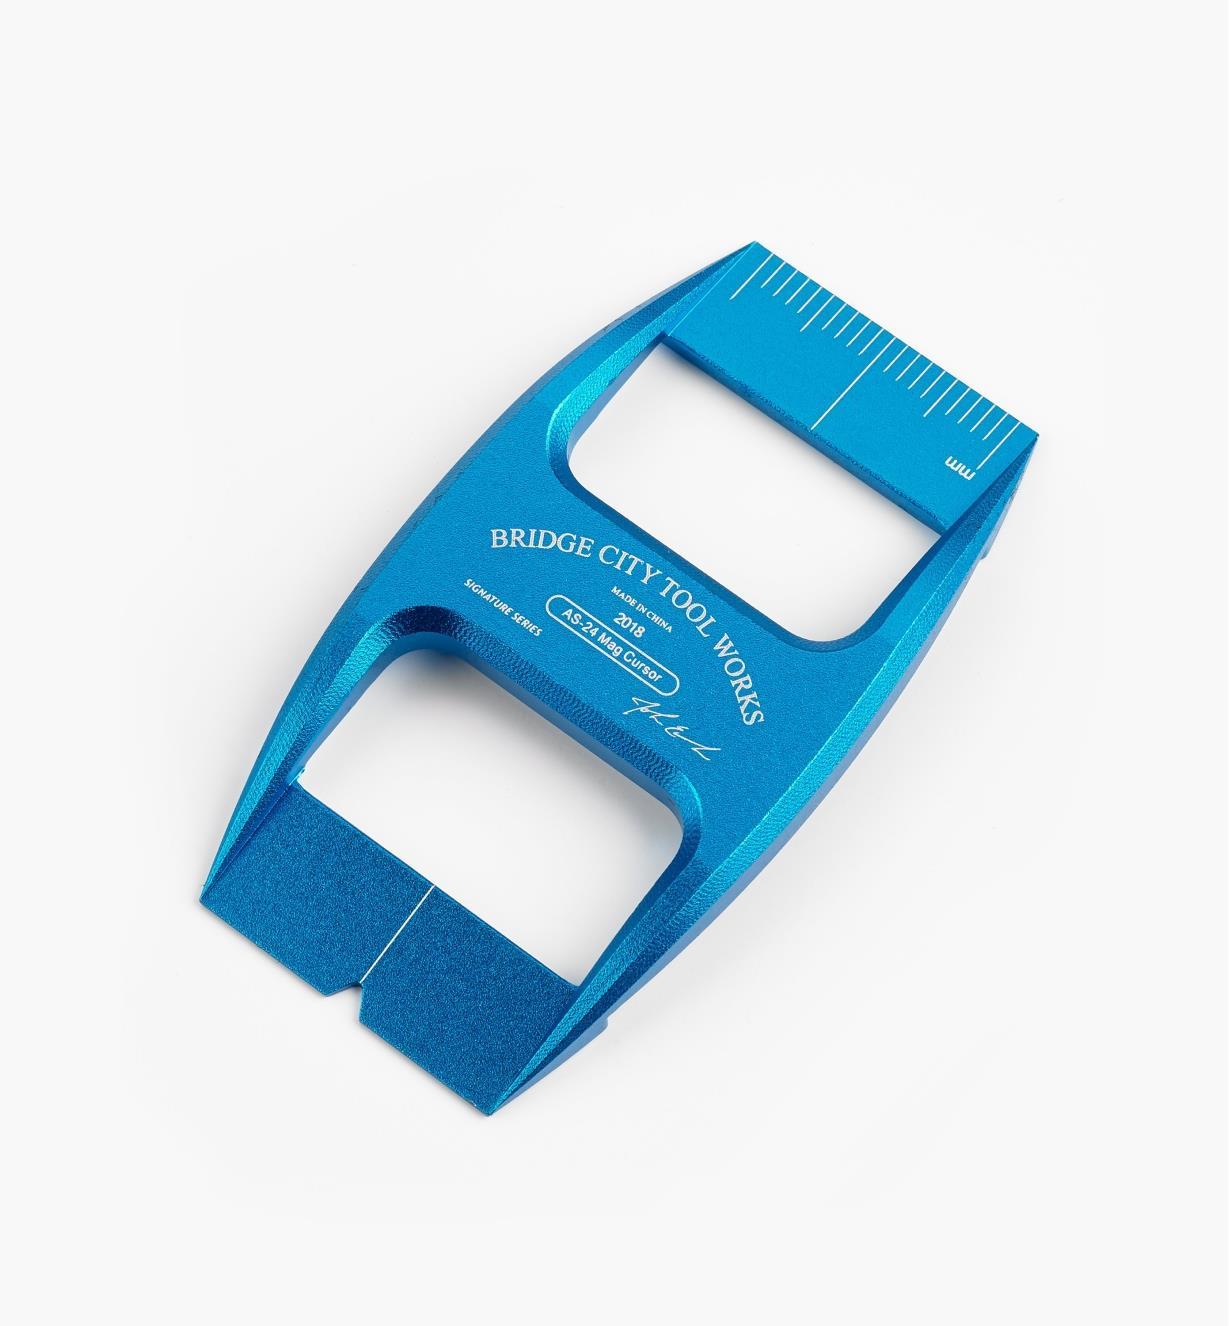 17N1687 - Bridge City Blue Metric Cursor